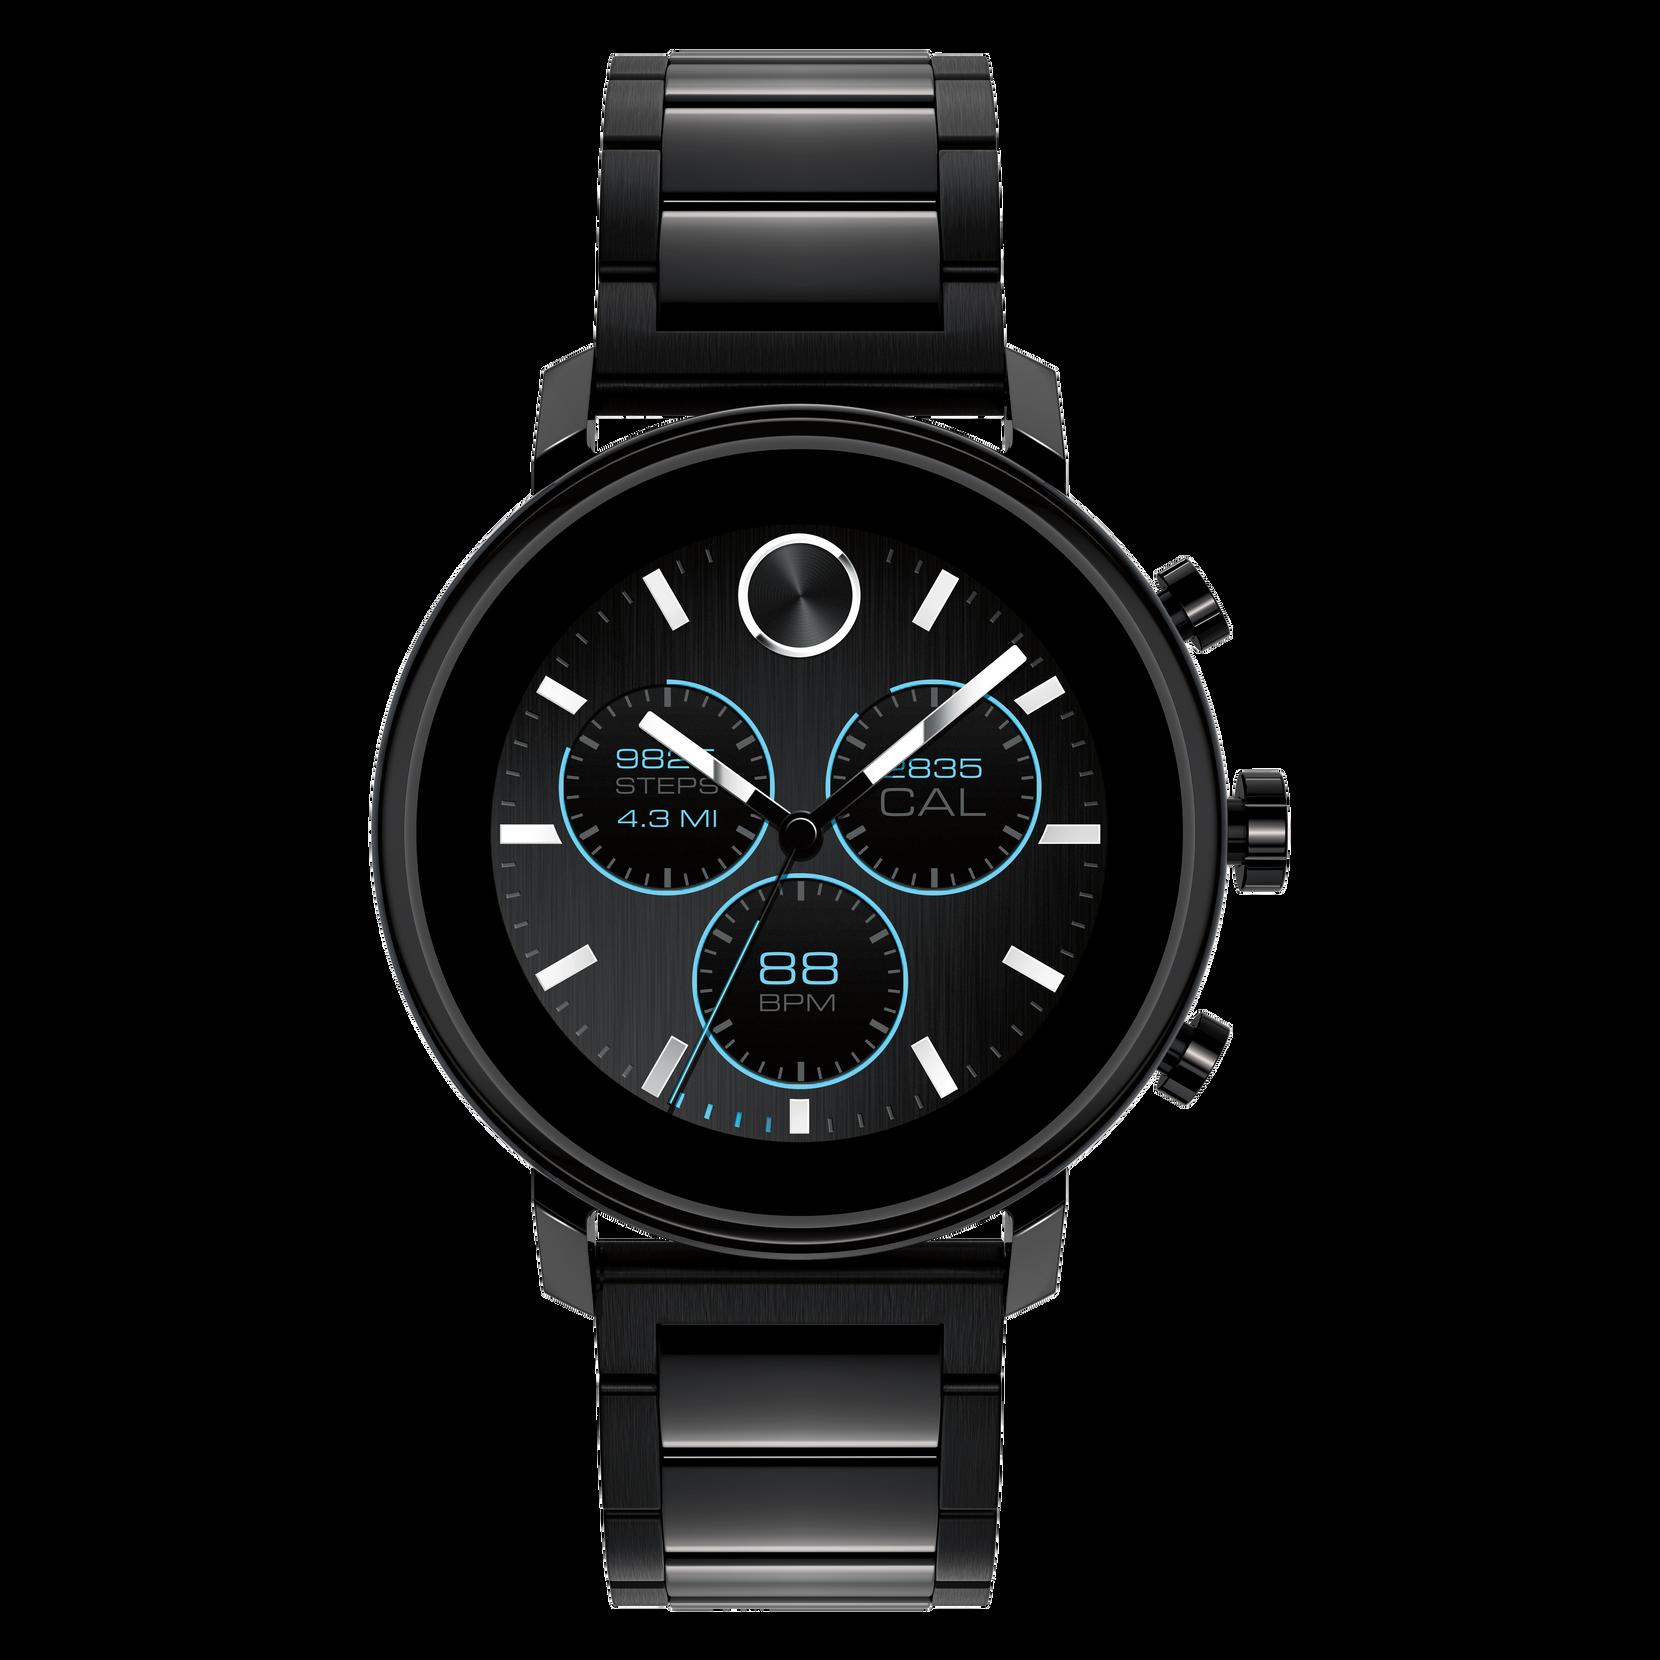 Movado | Movado Connect 2.0 black PVD smart watch with ...